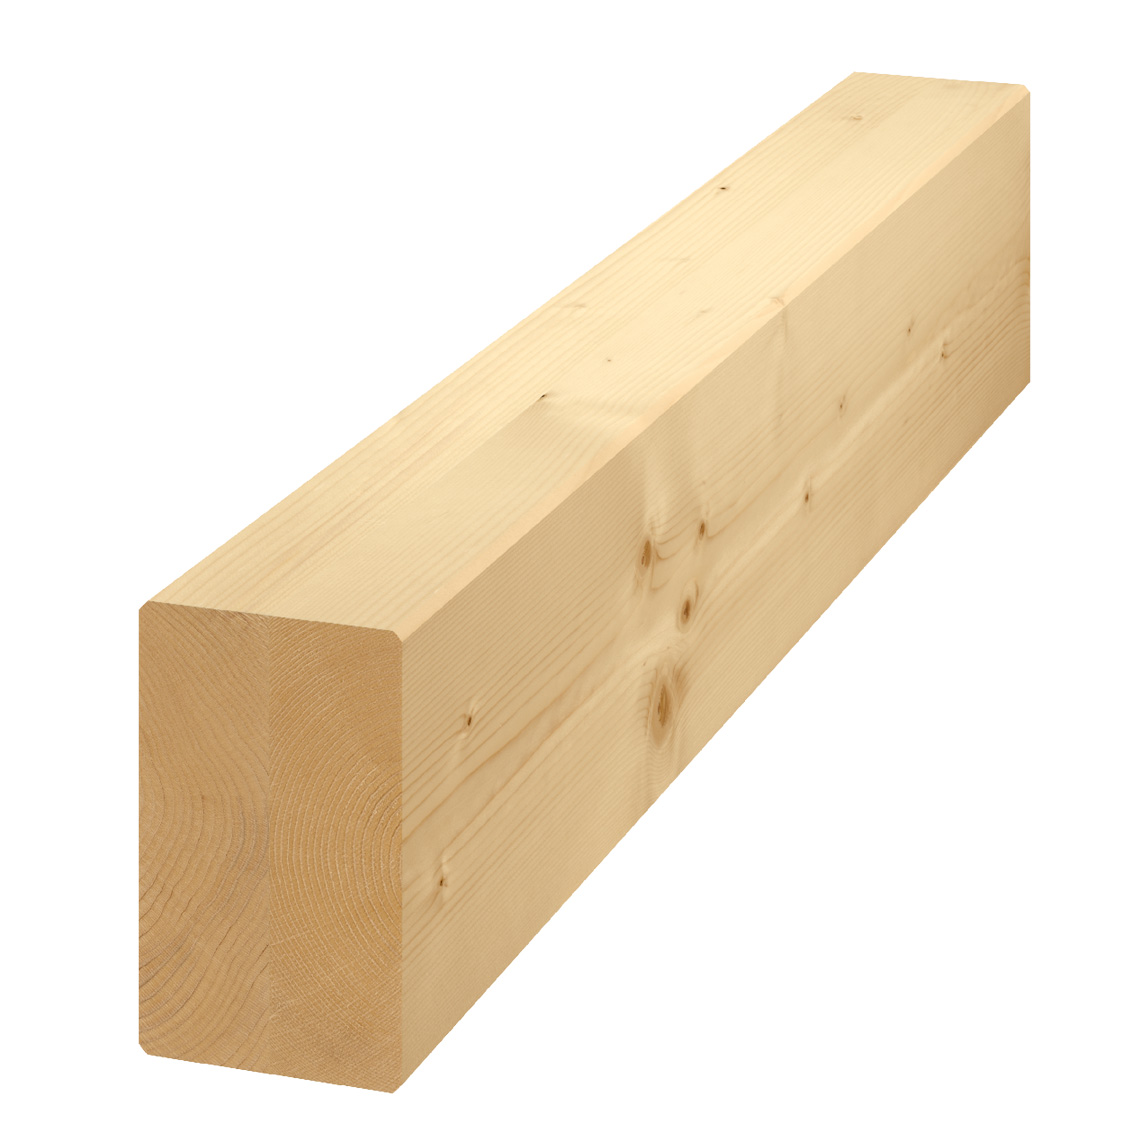 Balkenschichtholz